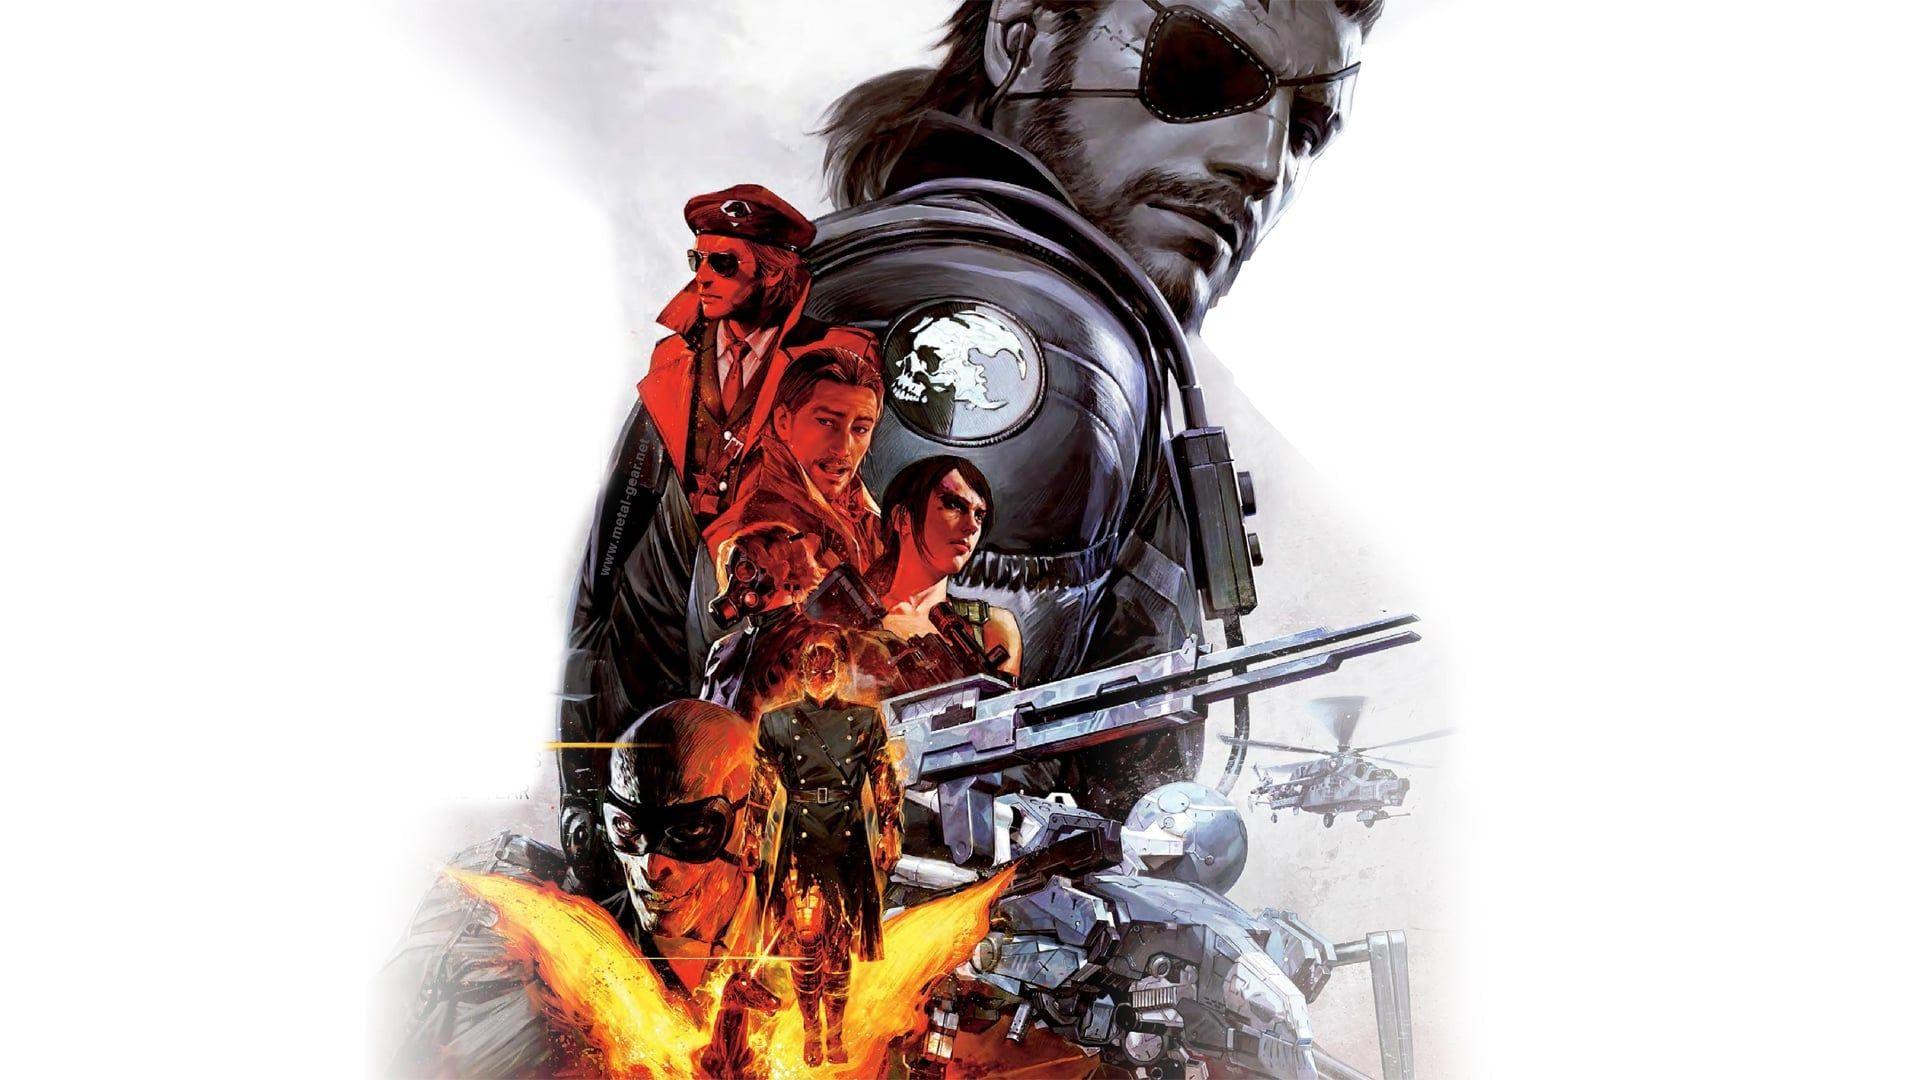 Metal Gear Solid 5 The Phantom Pain HD wallpapers